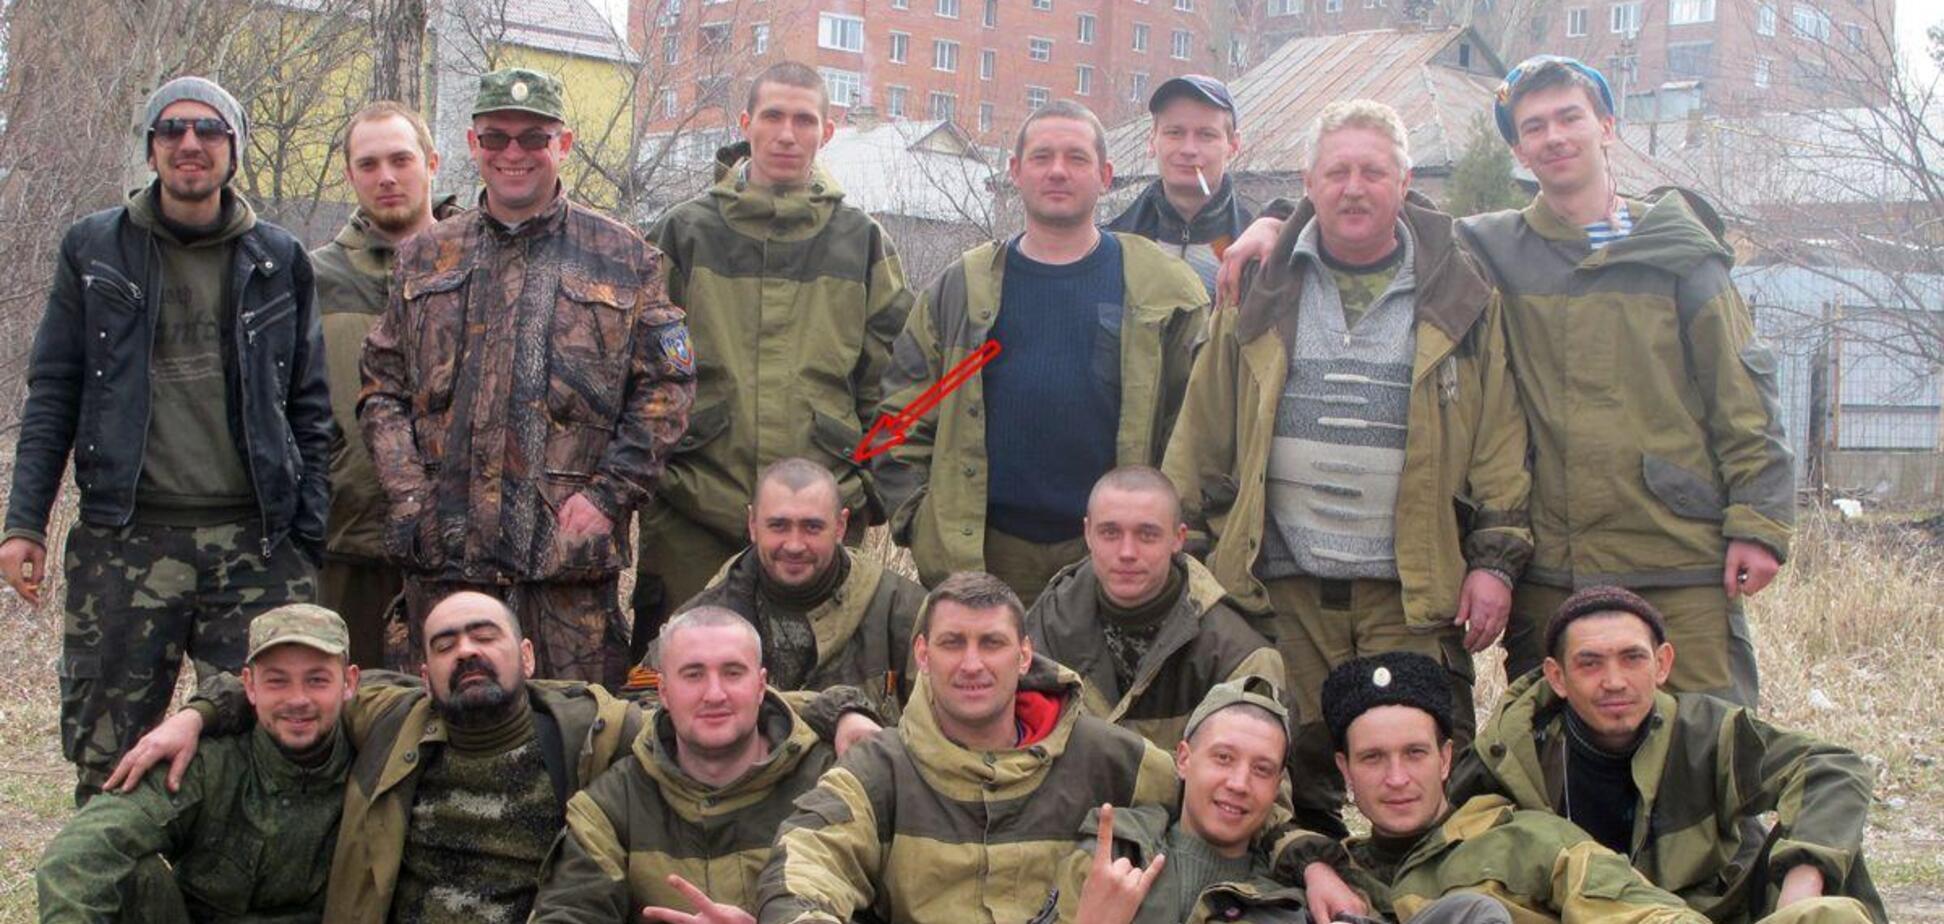 Оторвало ногу, разорвало органы: на Донбассе 'отминусовали' террориста 'Дракона'. Фотофакт